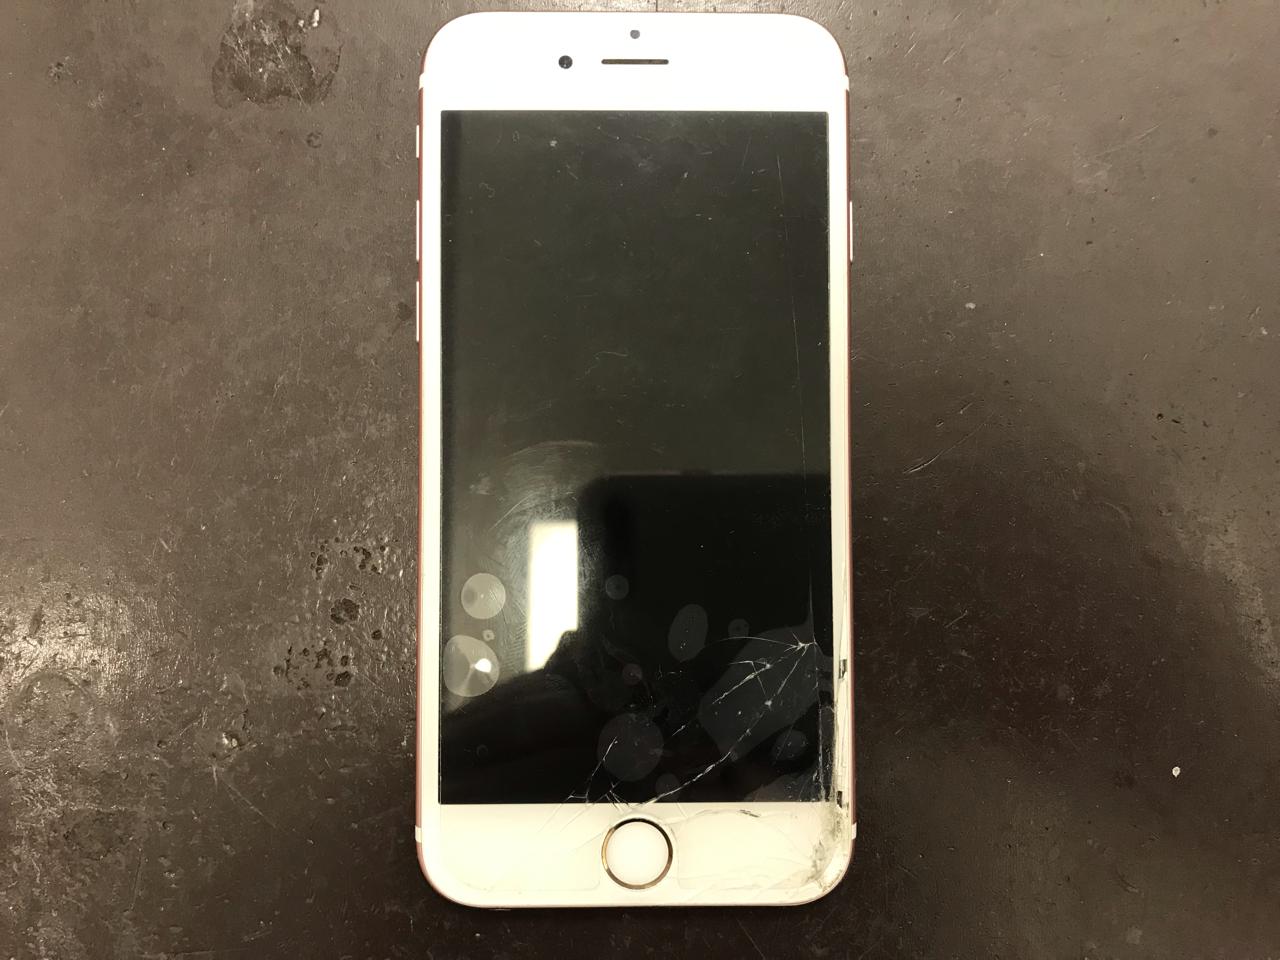 smartphone_suwaru_woman スマホの画面が真っ暗になる原因と対処法教えます!✨